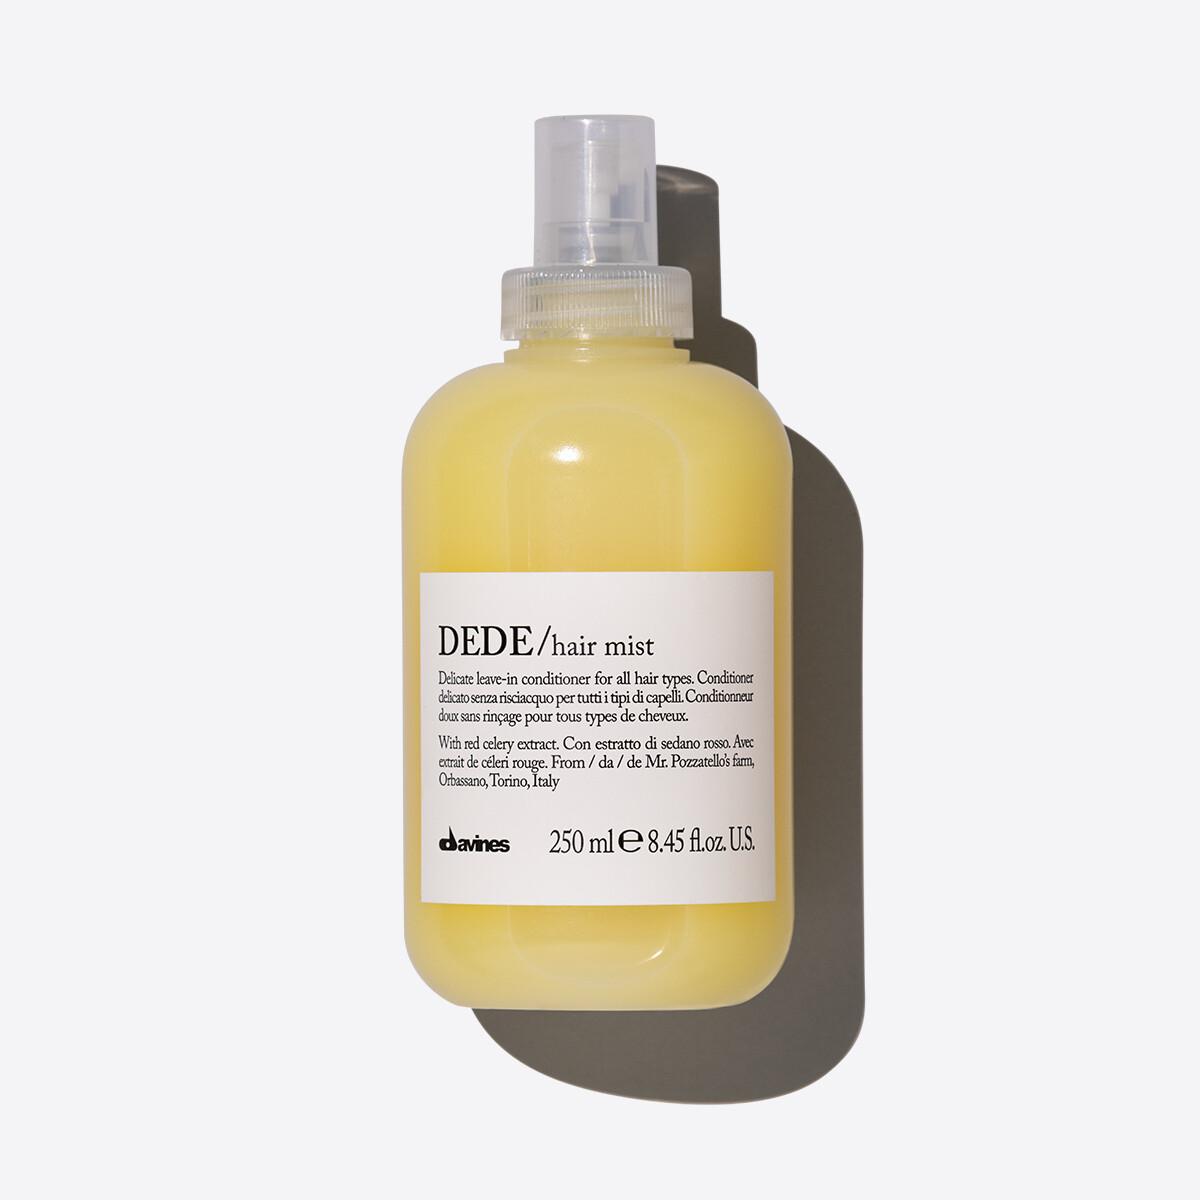 DEDE/ hair mist 250 ml